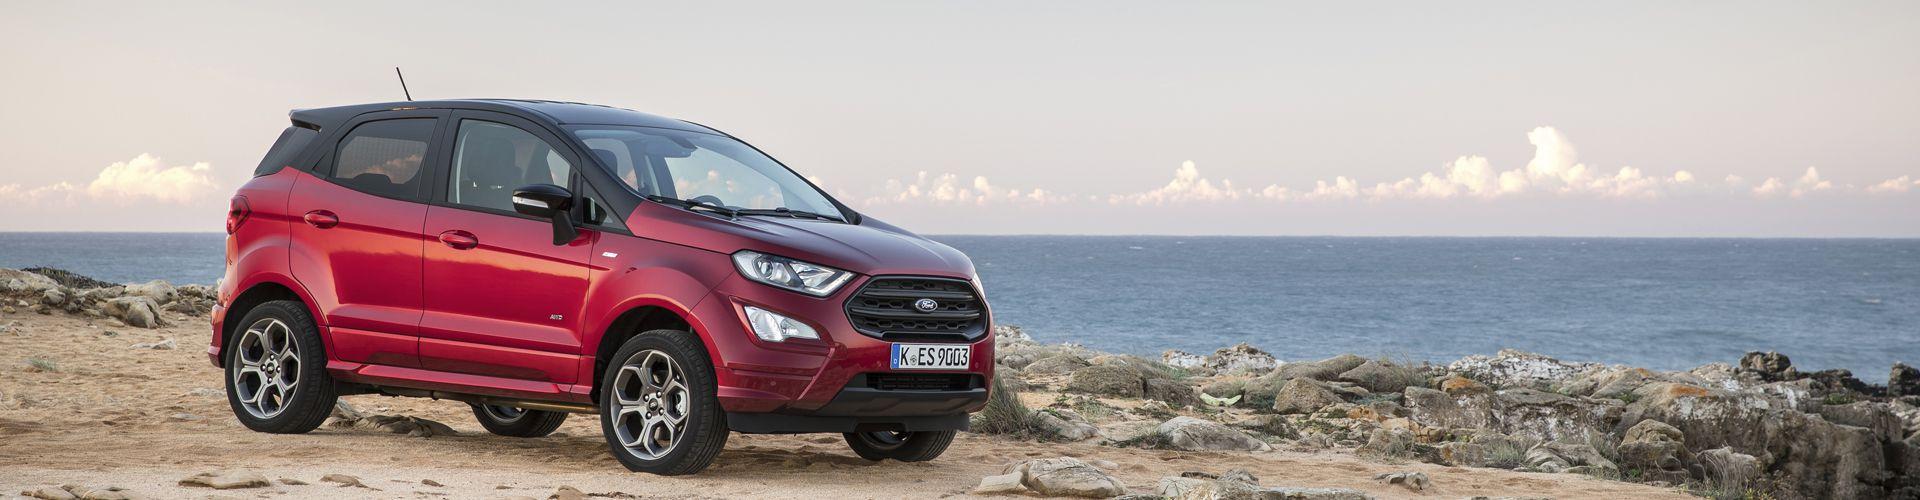 Ford Ecosport - Αφοί Α